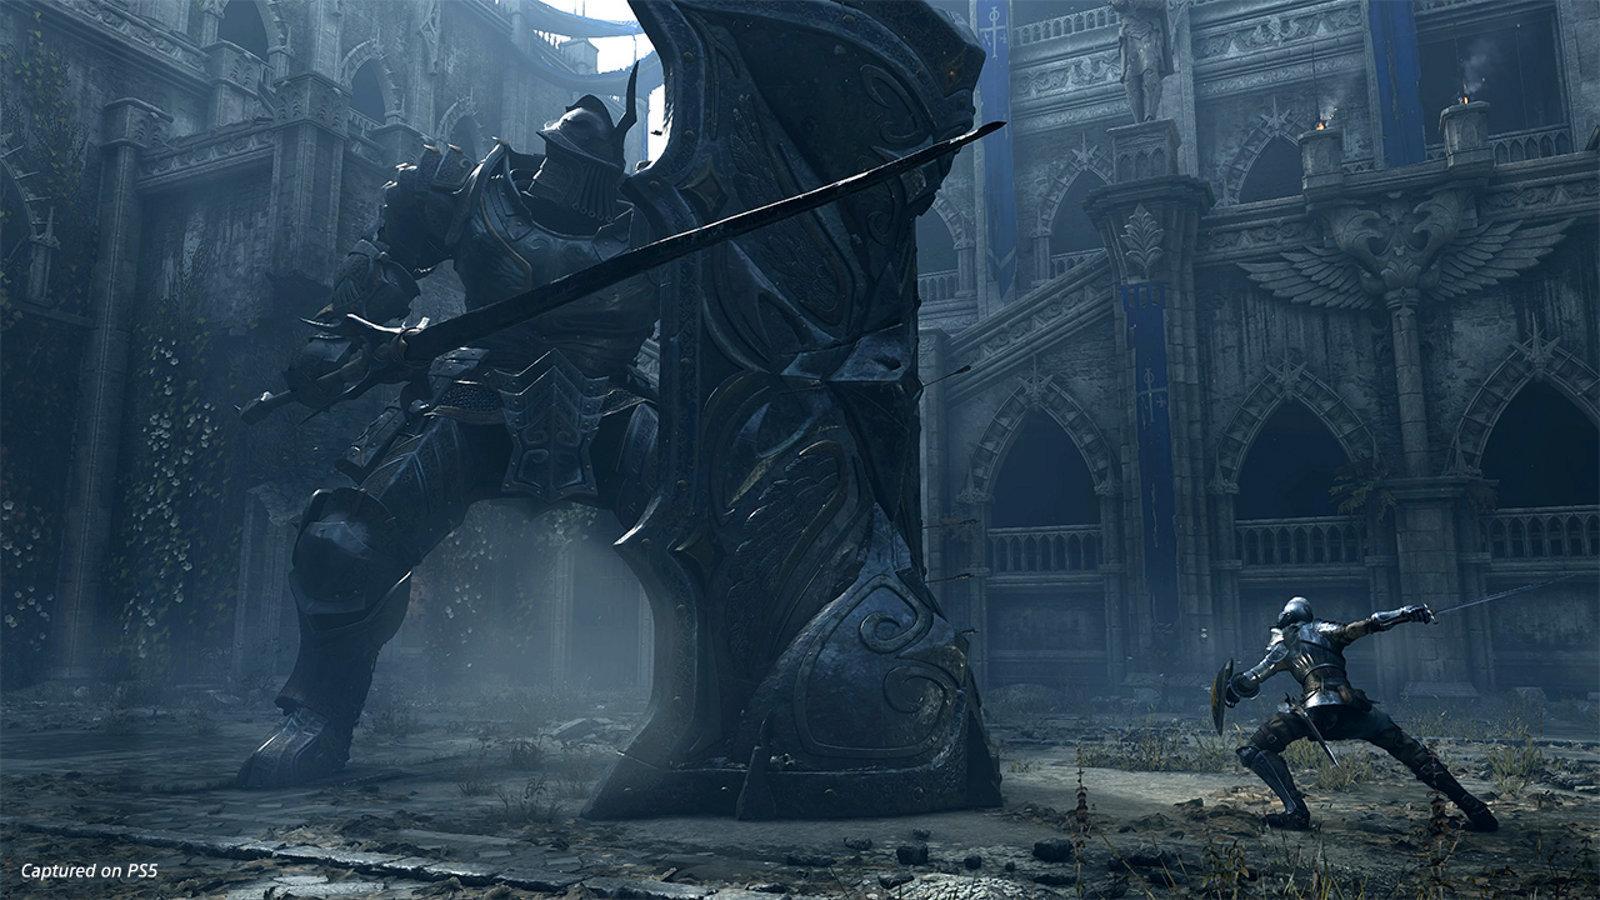 Afinal Demon's Souls será um exclusivo PS5